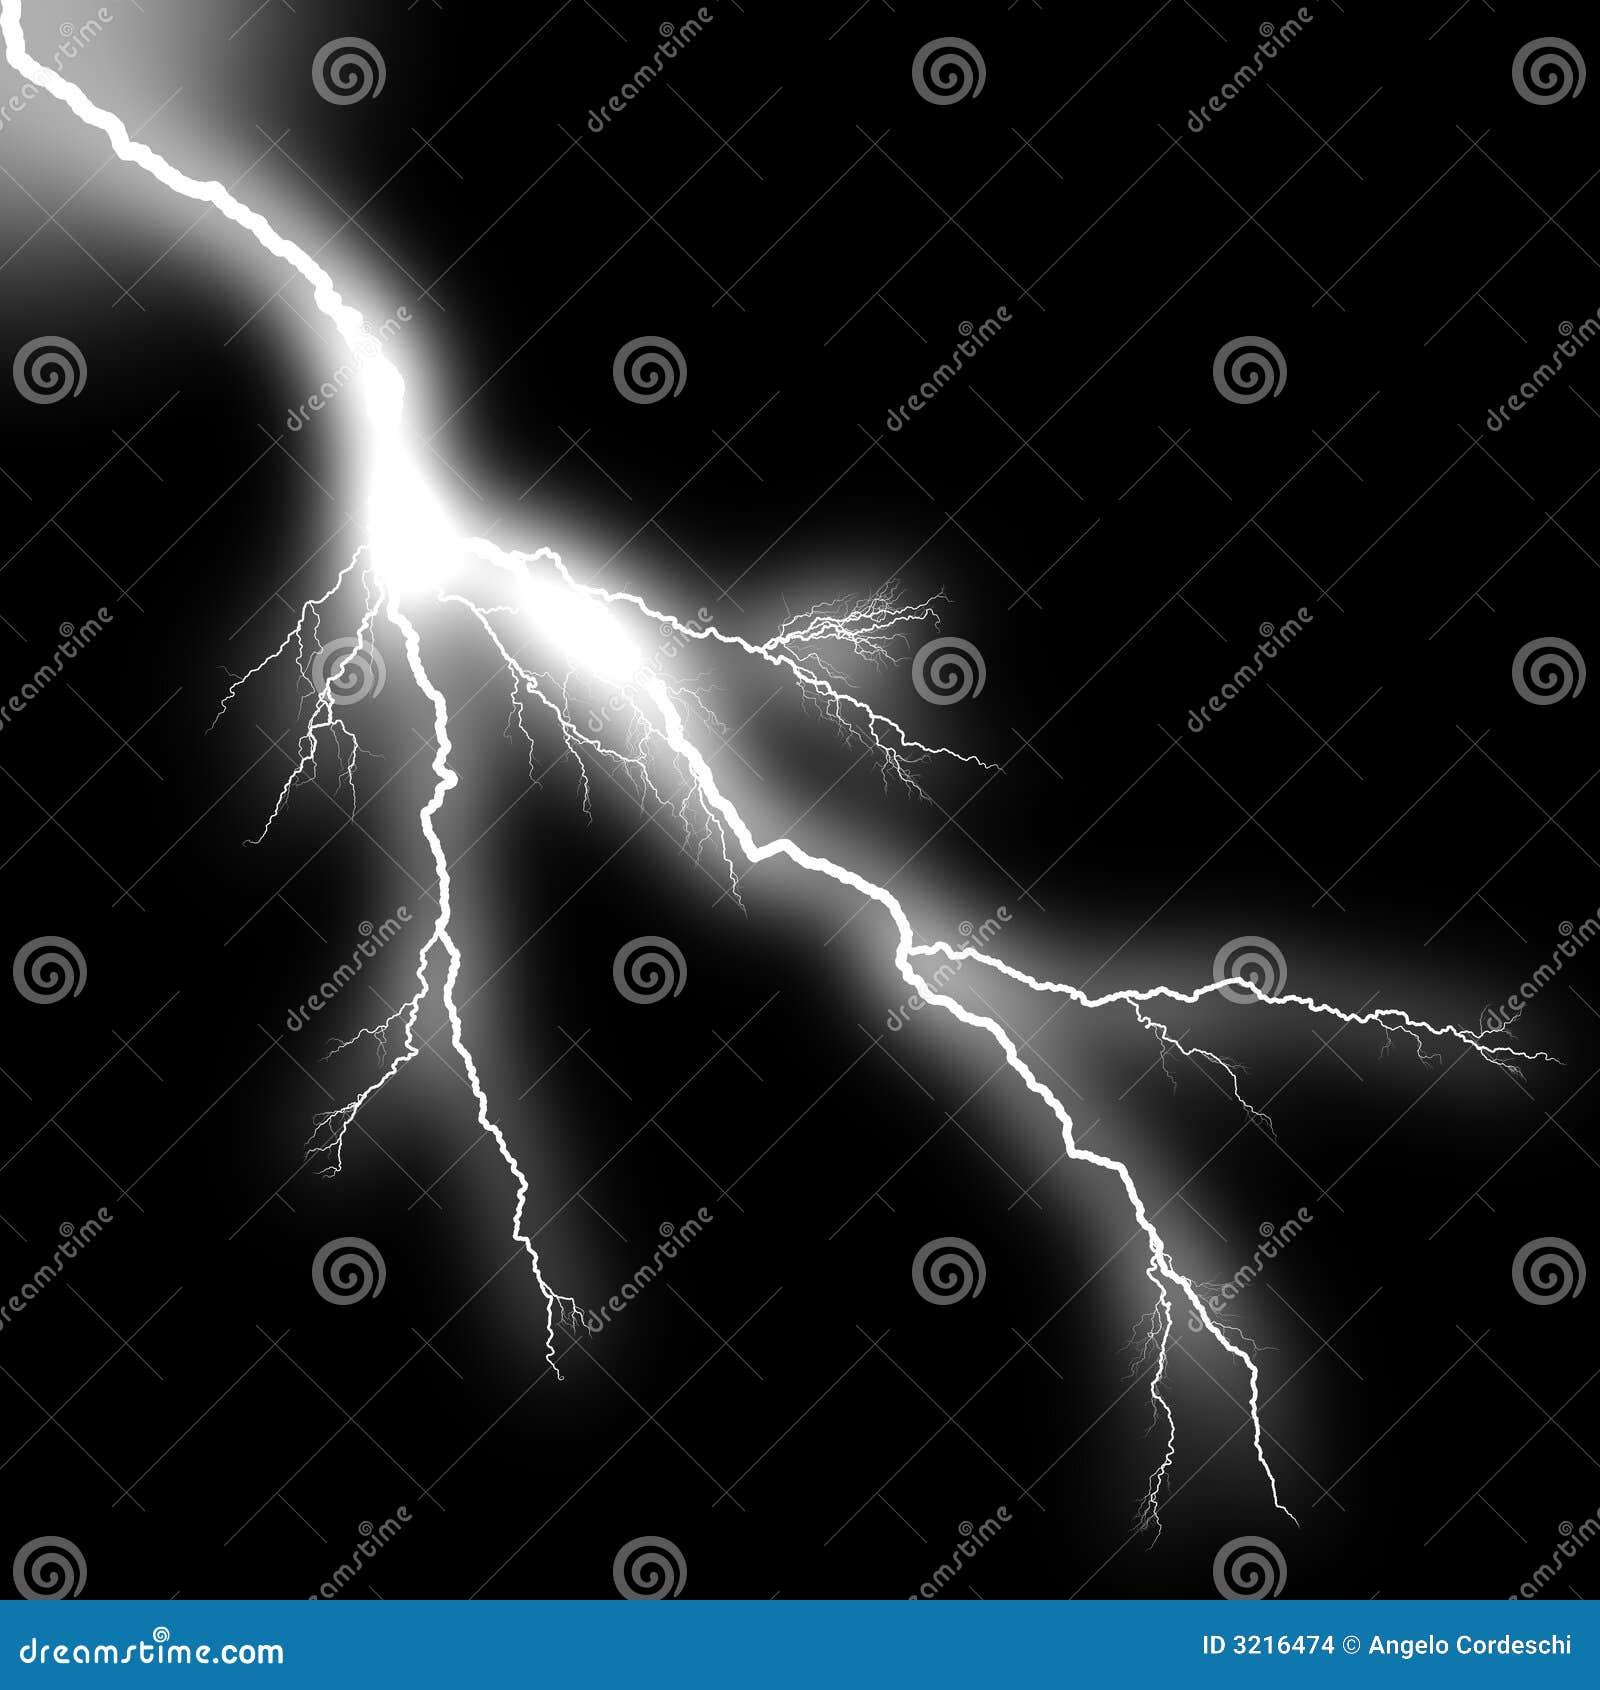 Lightning Old Horror Movie Stock Images Image 3216474